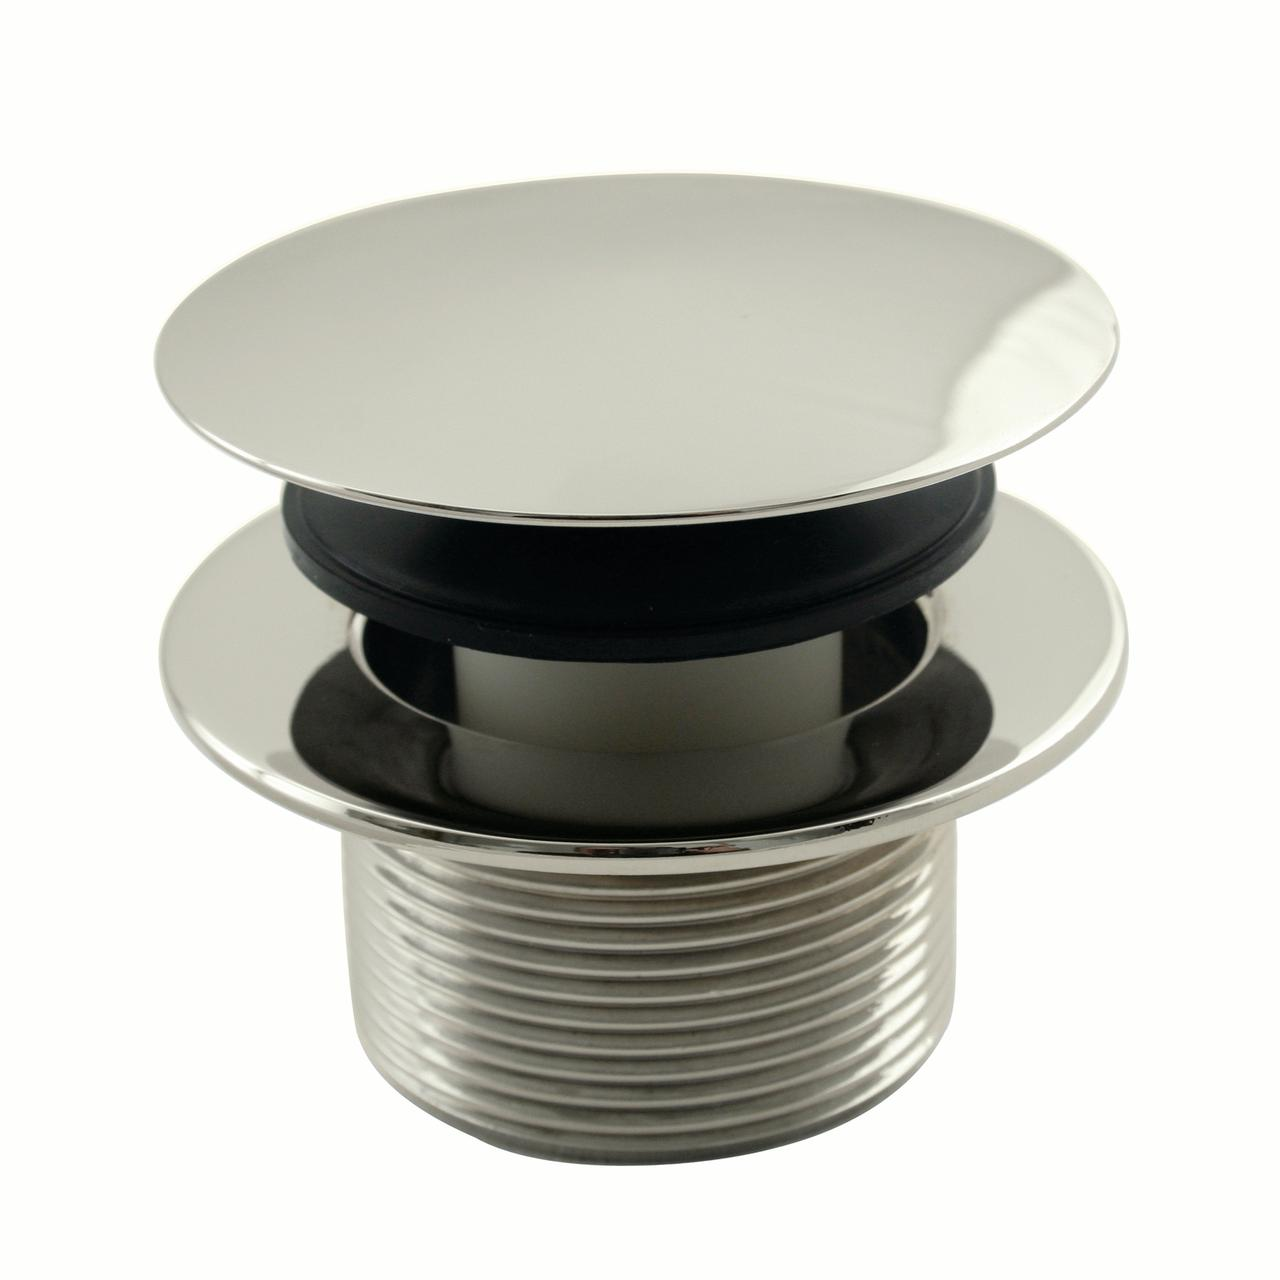 Westbrass Mushroom Tip Toe 1-1/2 in. NPSM Coarse Thread Bath Drain D398R in Polished Nickel